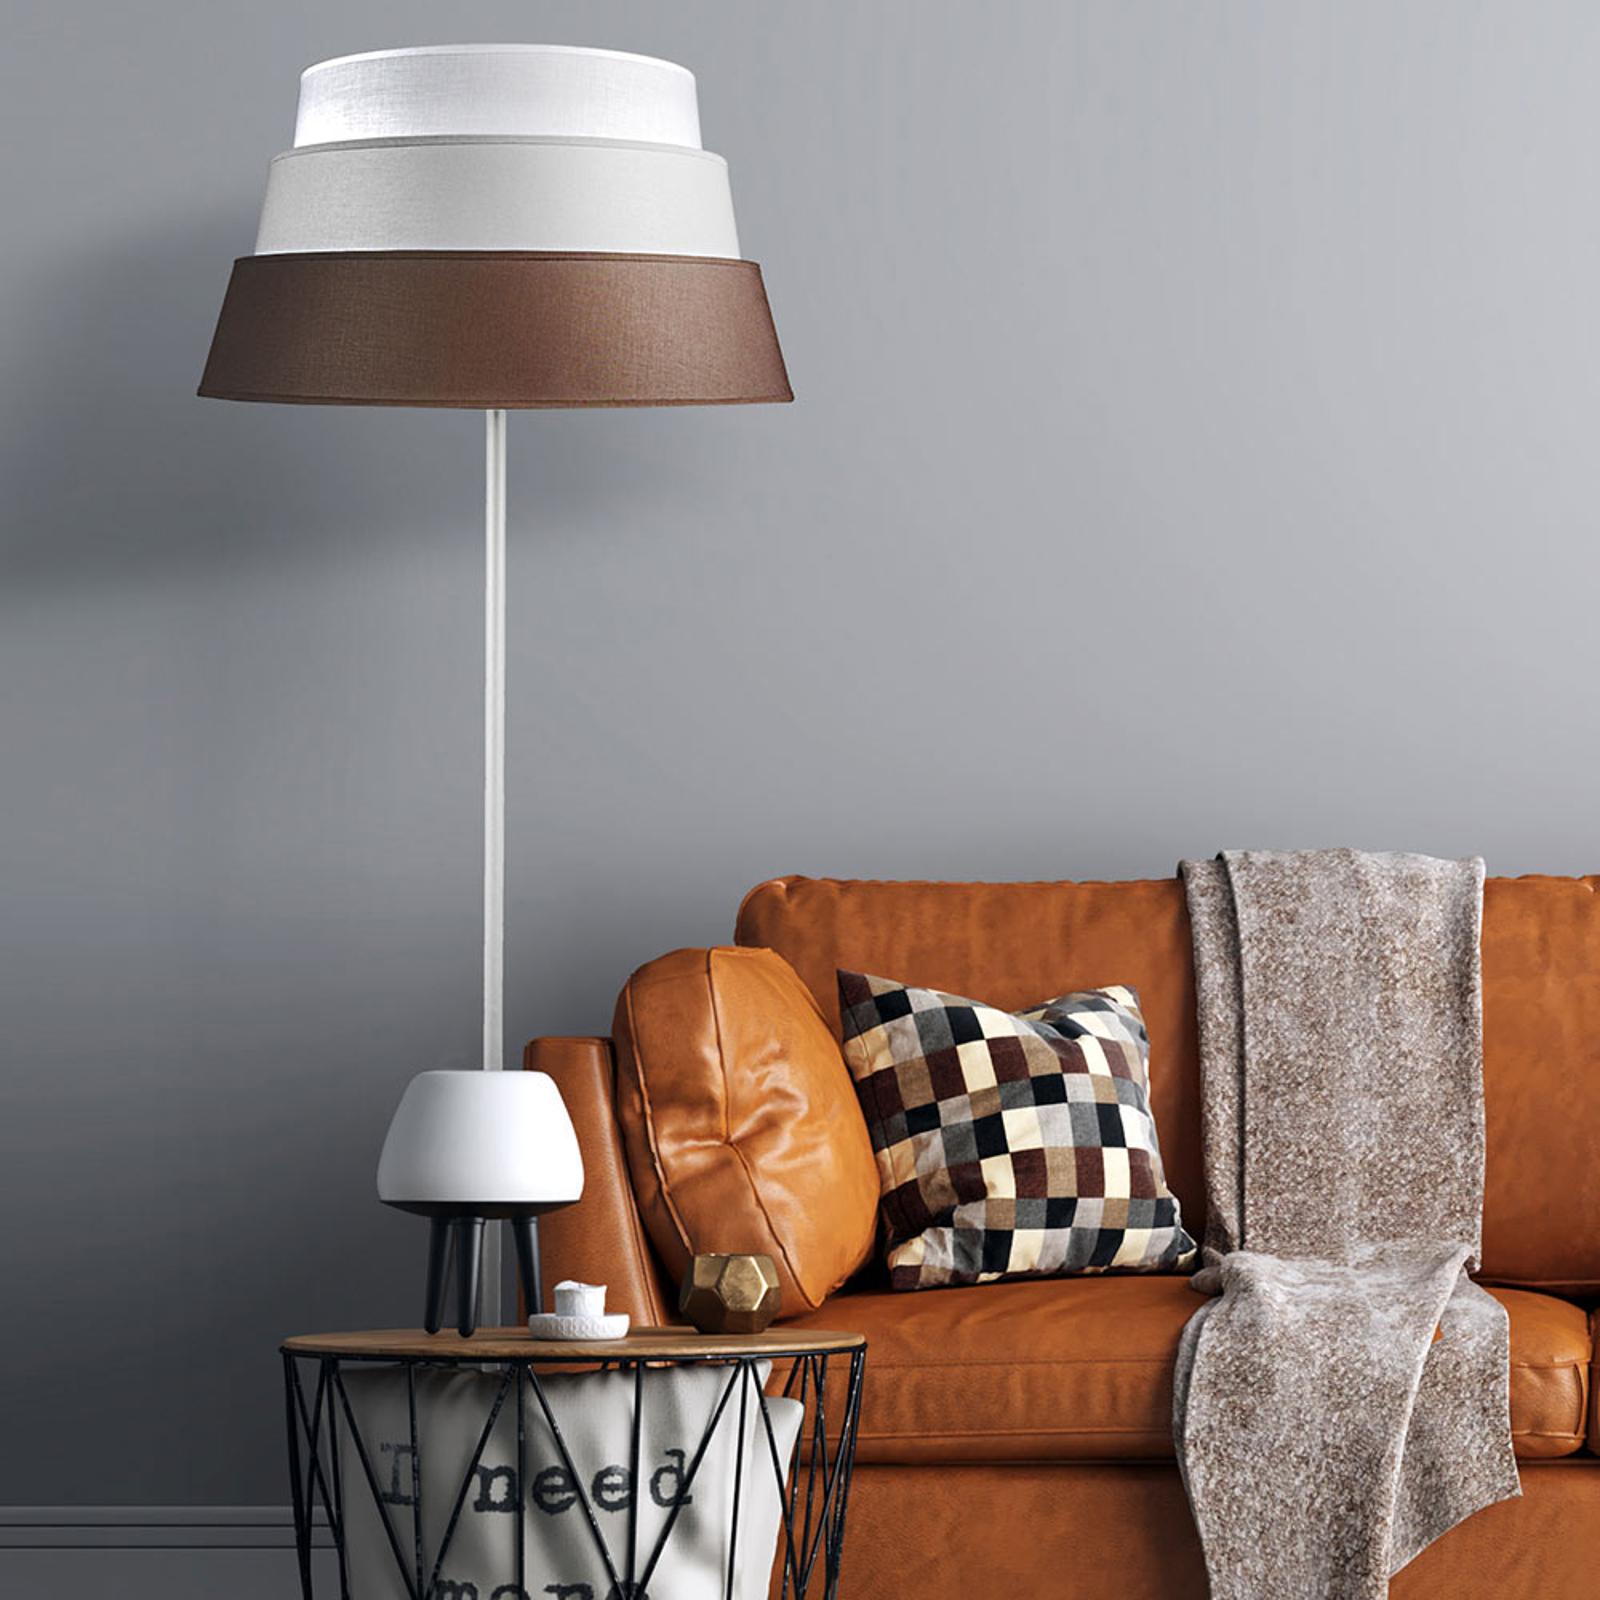 Vloerlamp Piramida, bruin/grijs/wit